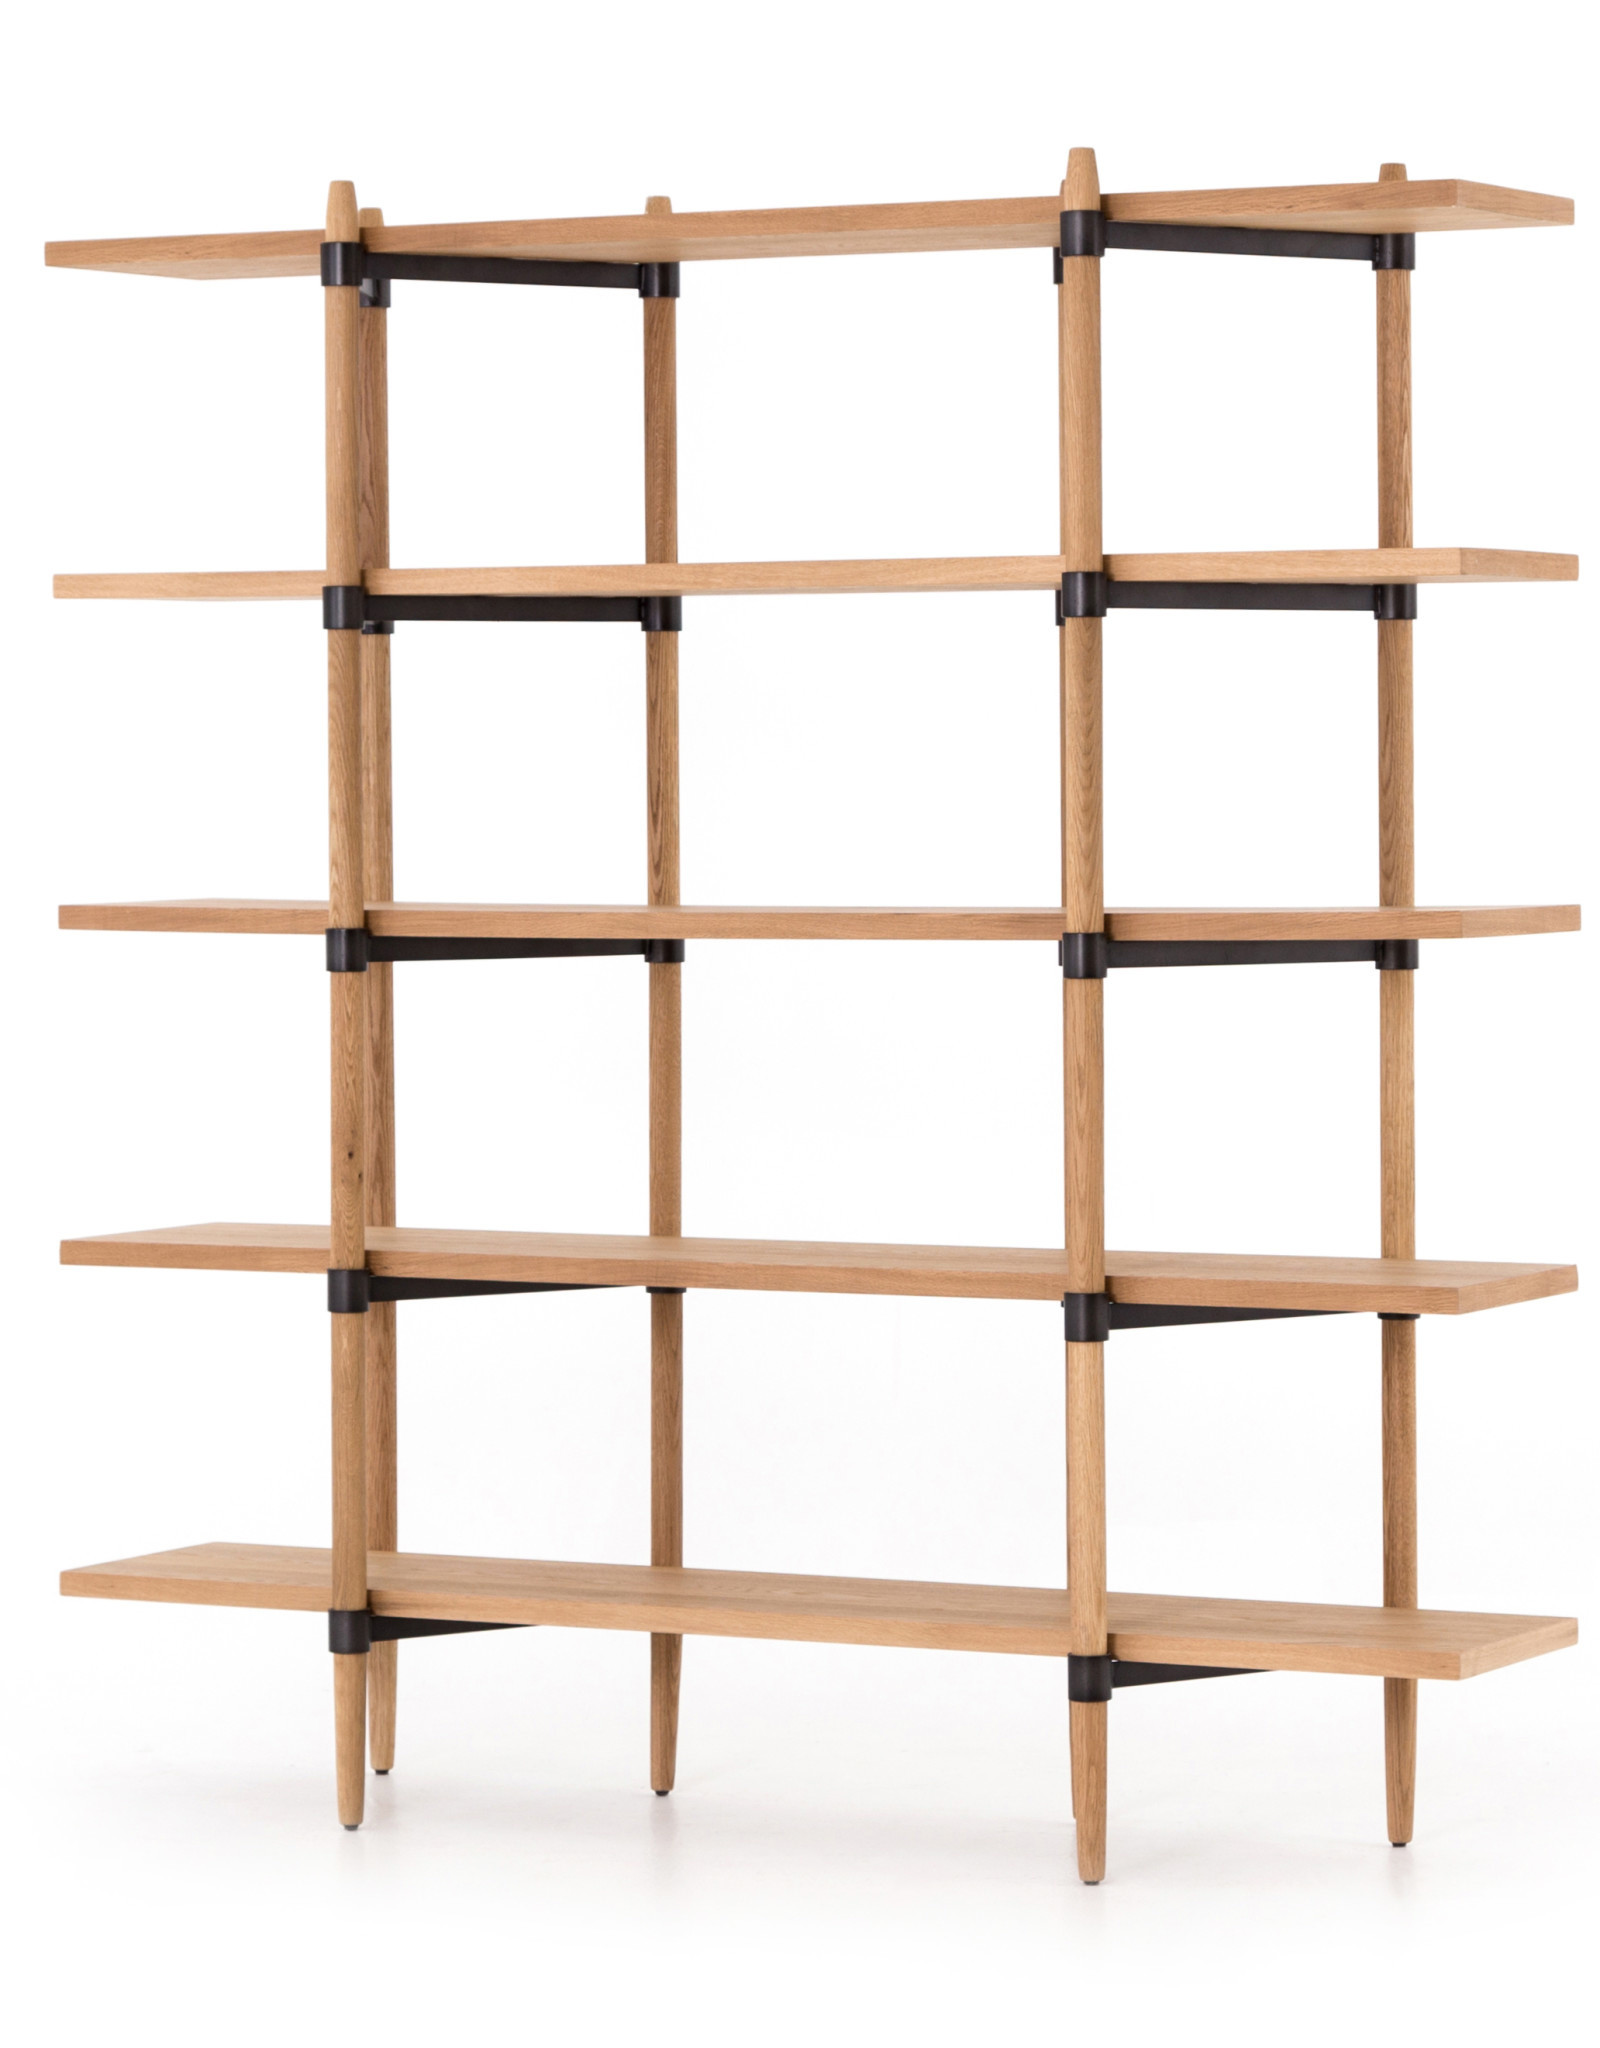 Oak & Metal Open Concept Bookshelf